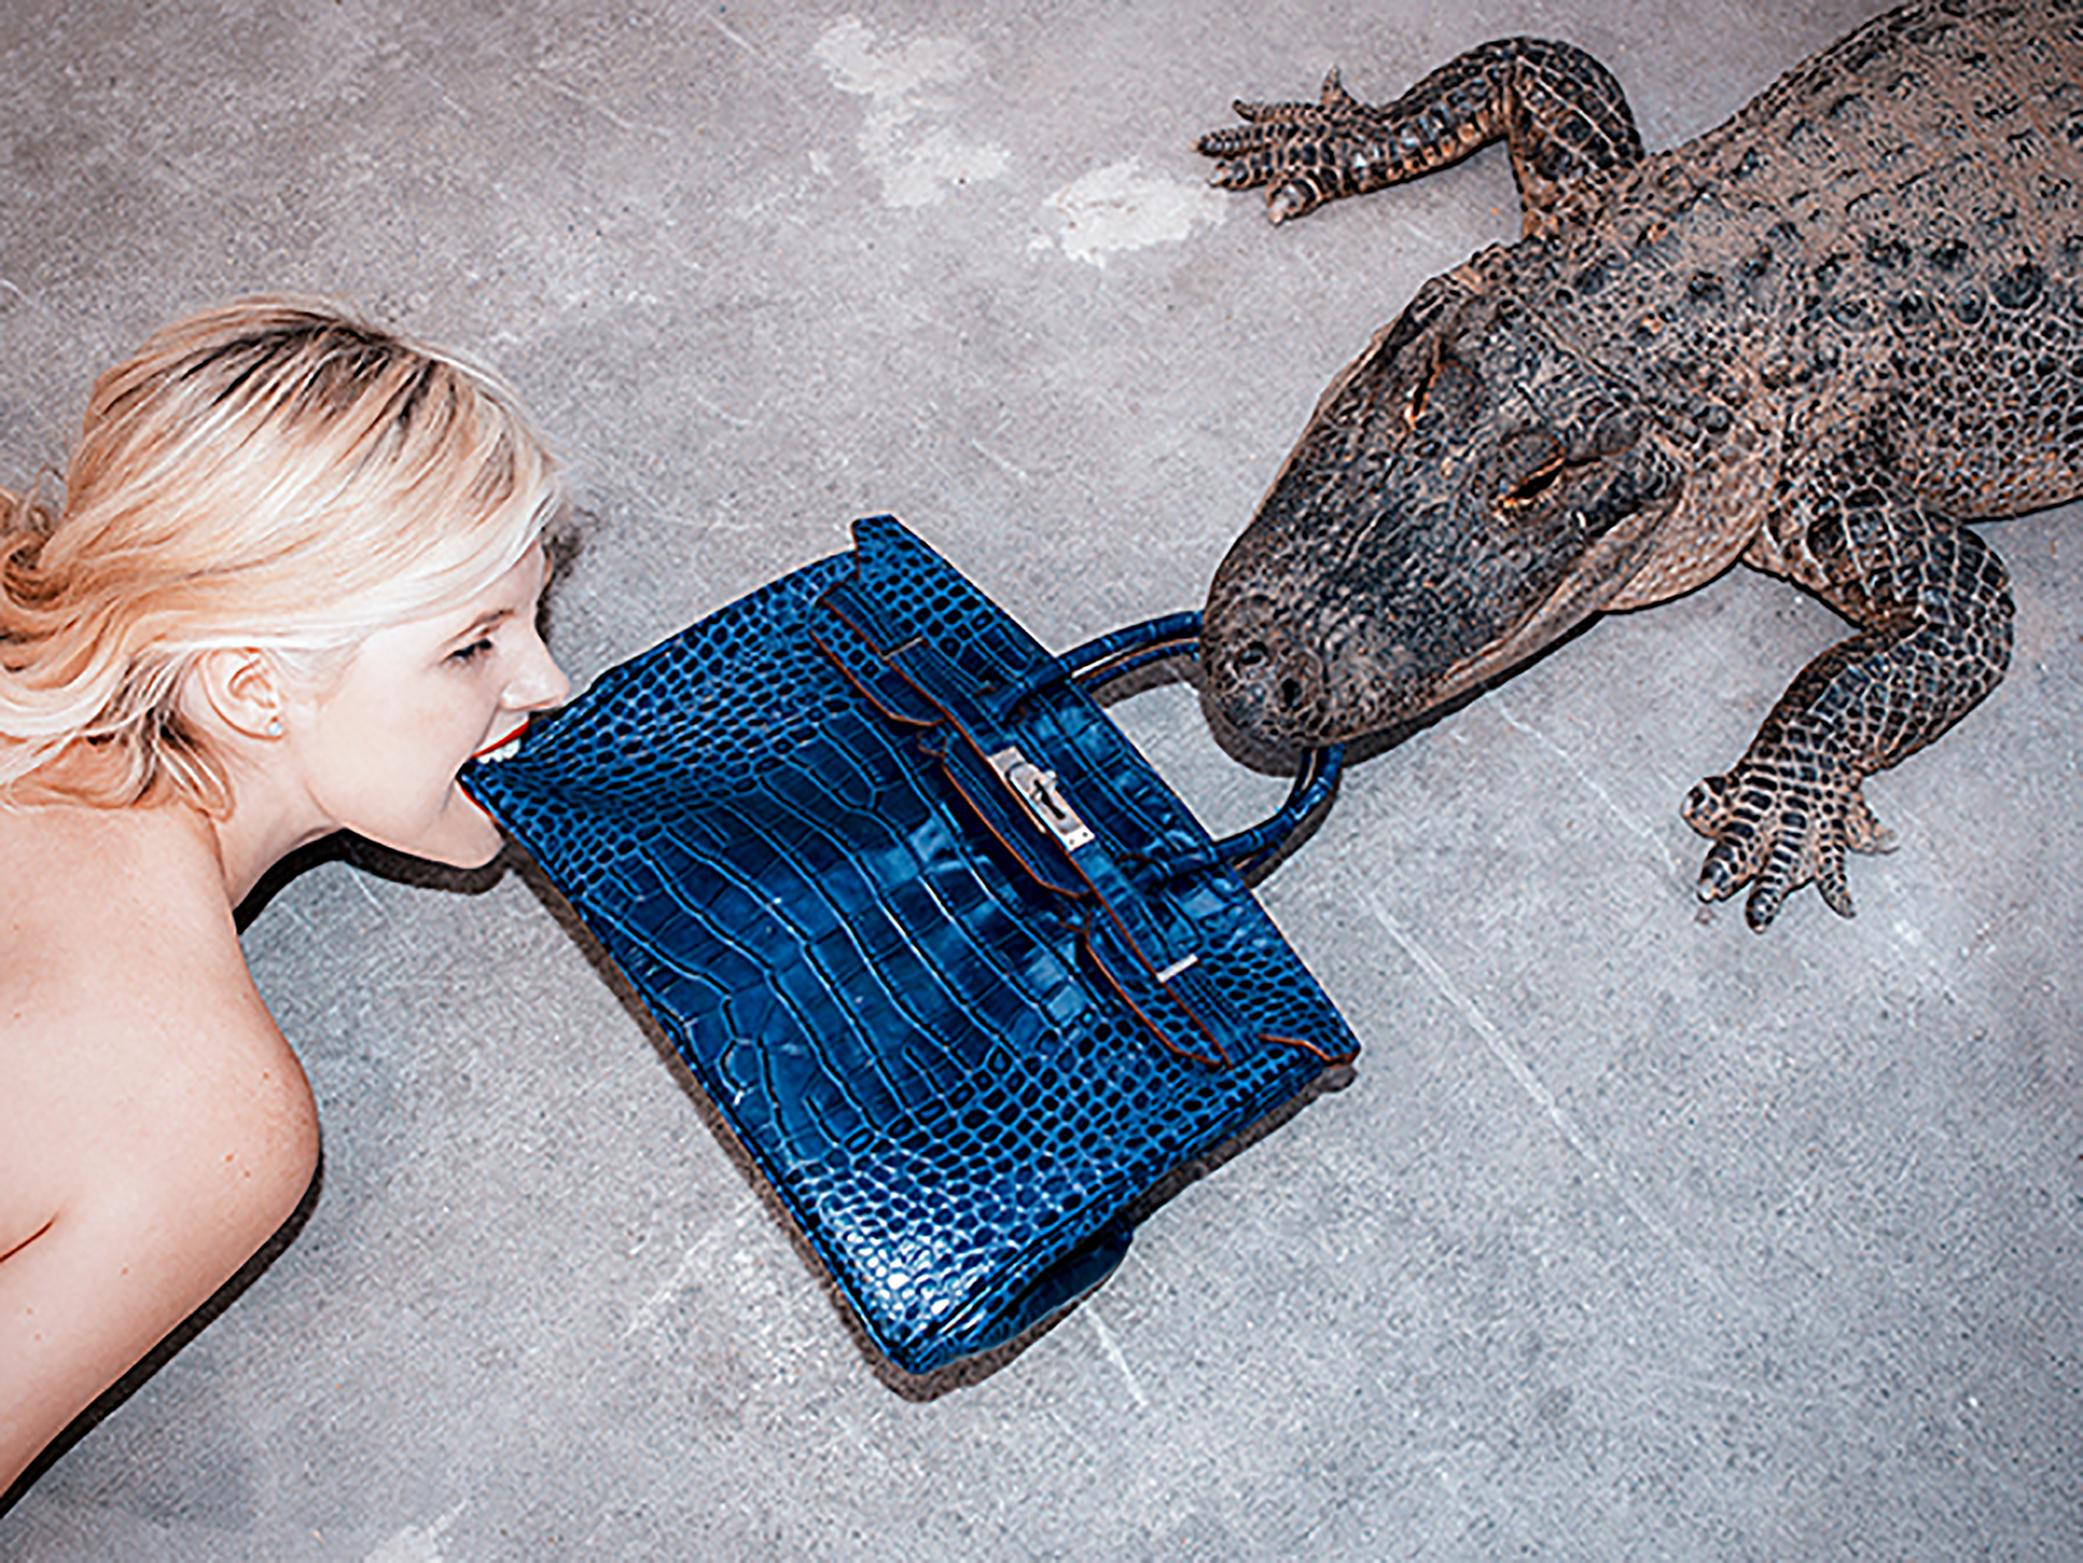 Tyler Shields, 'Gator Birkin III' 2012